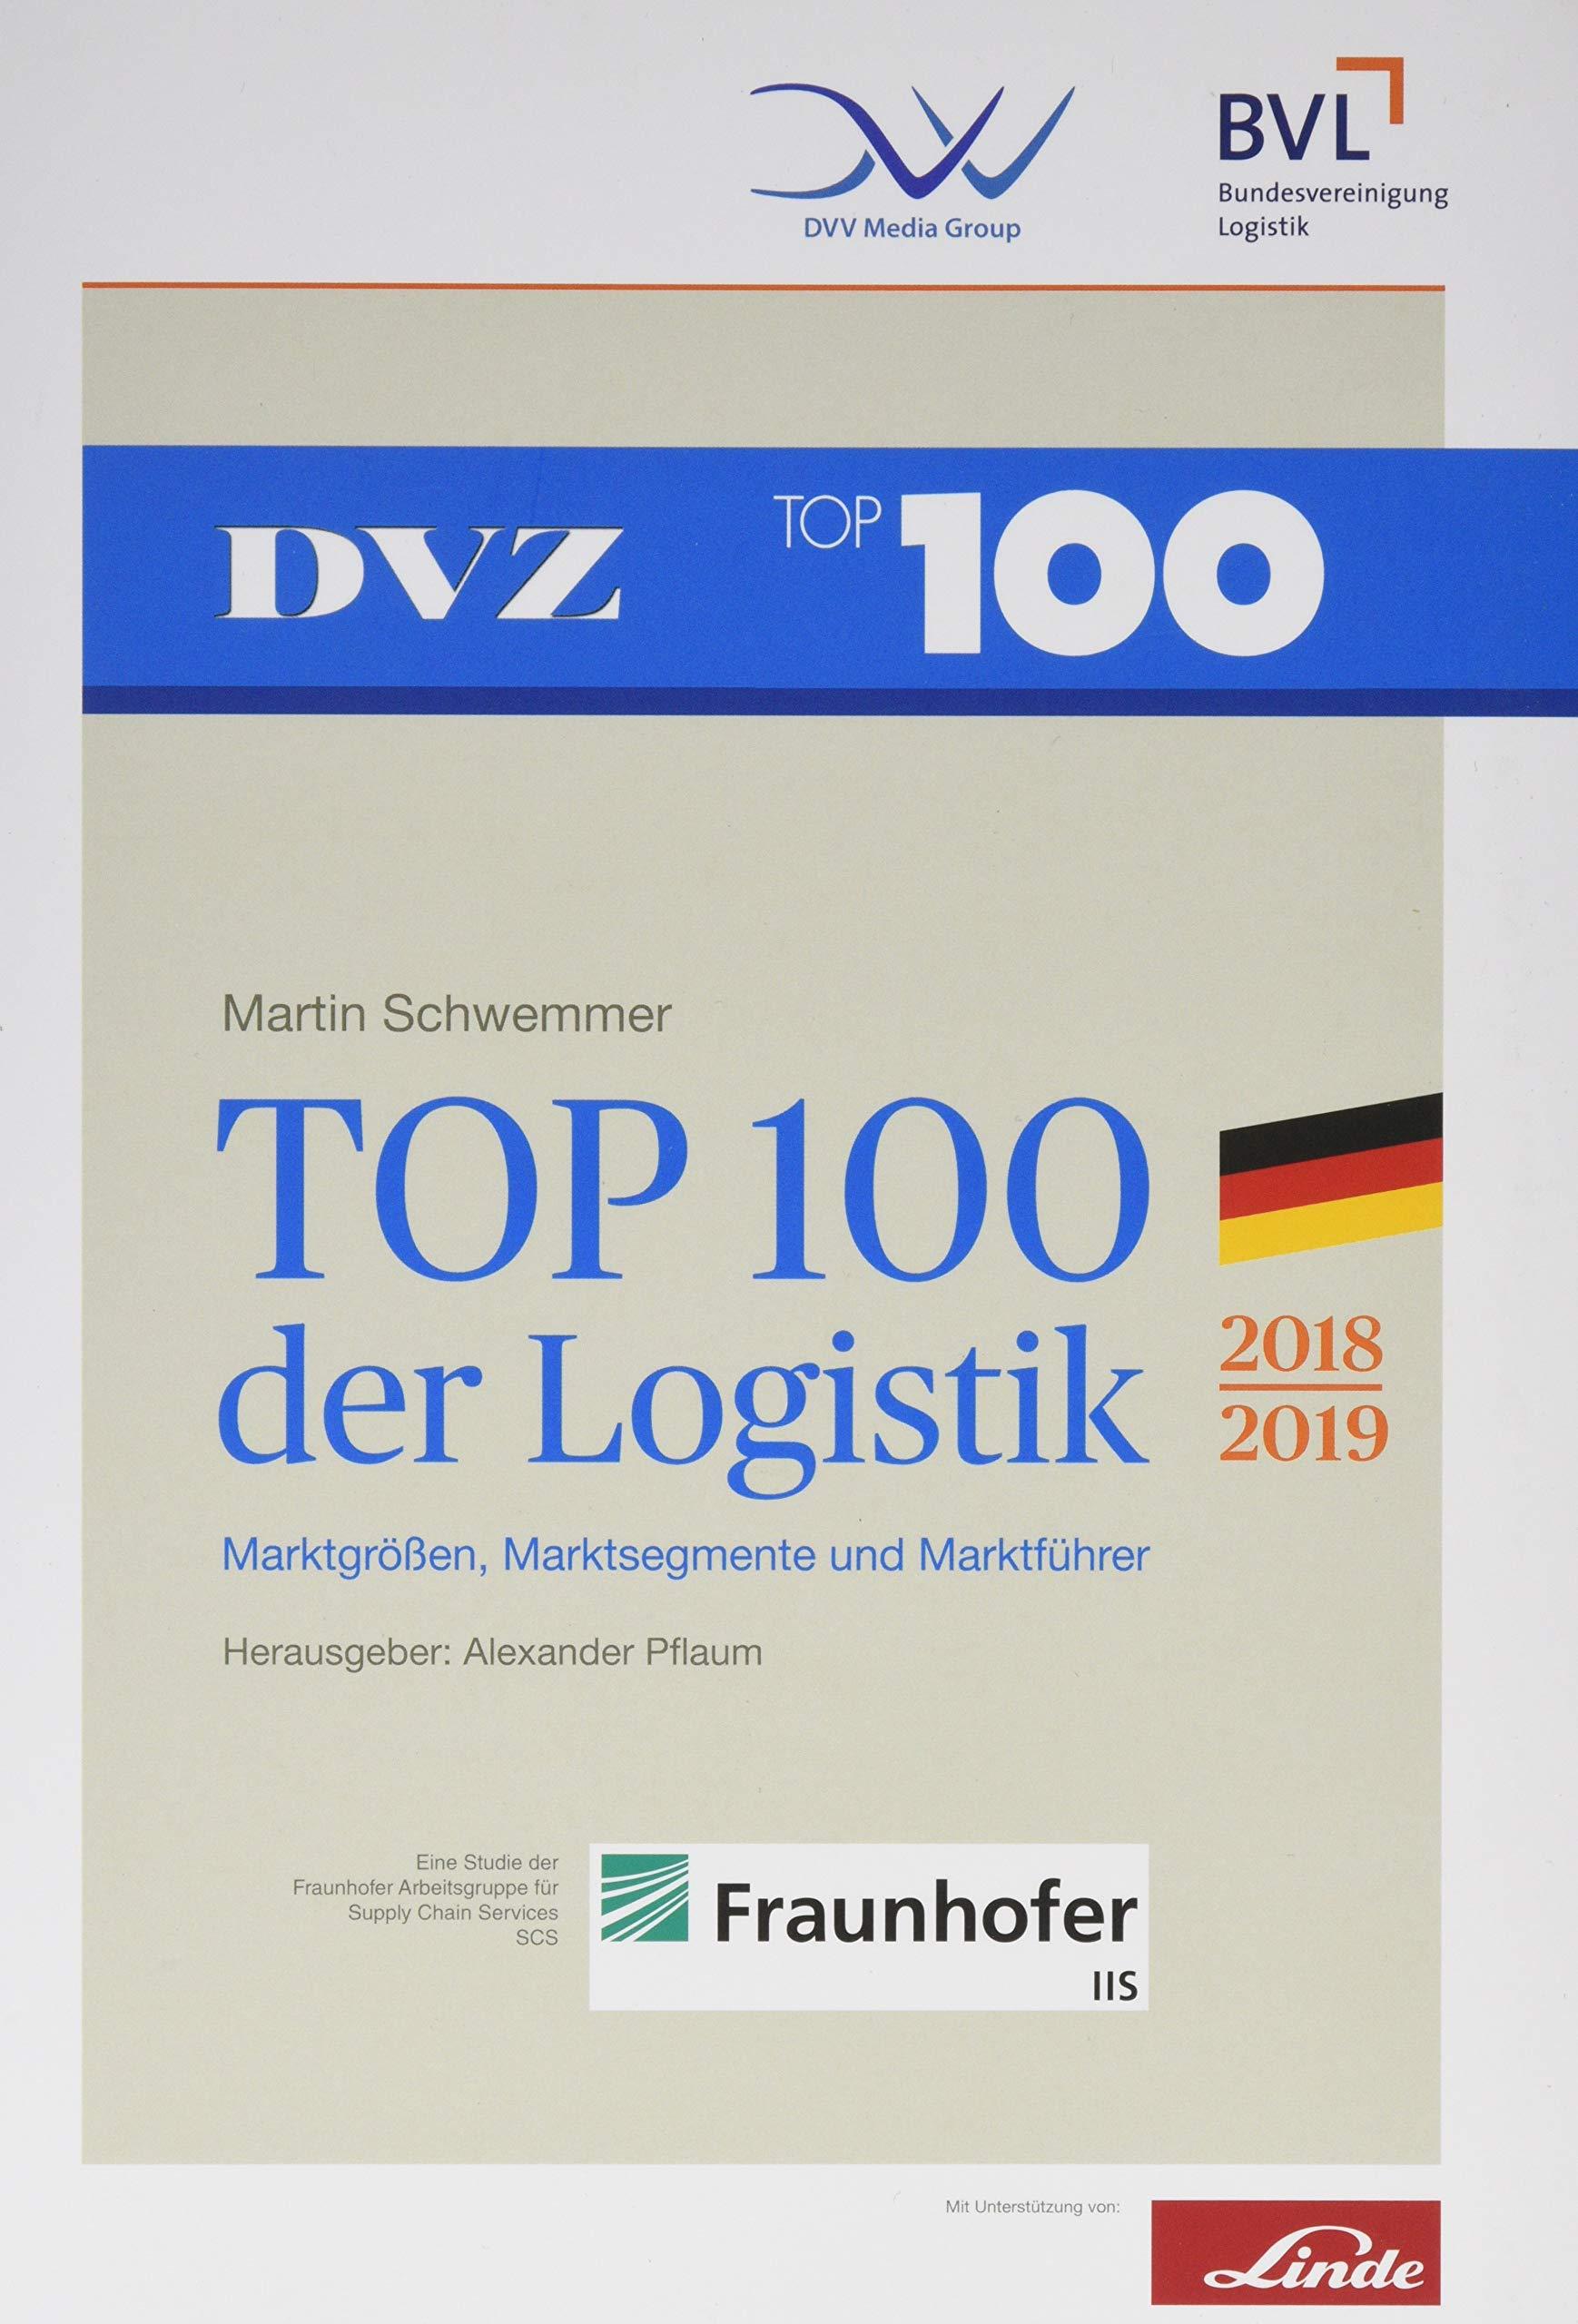 TOP 100 Der Logistik 2018 2019